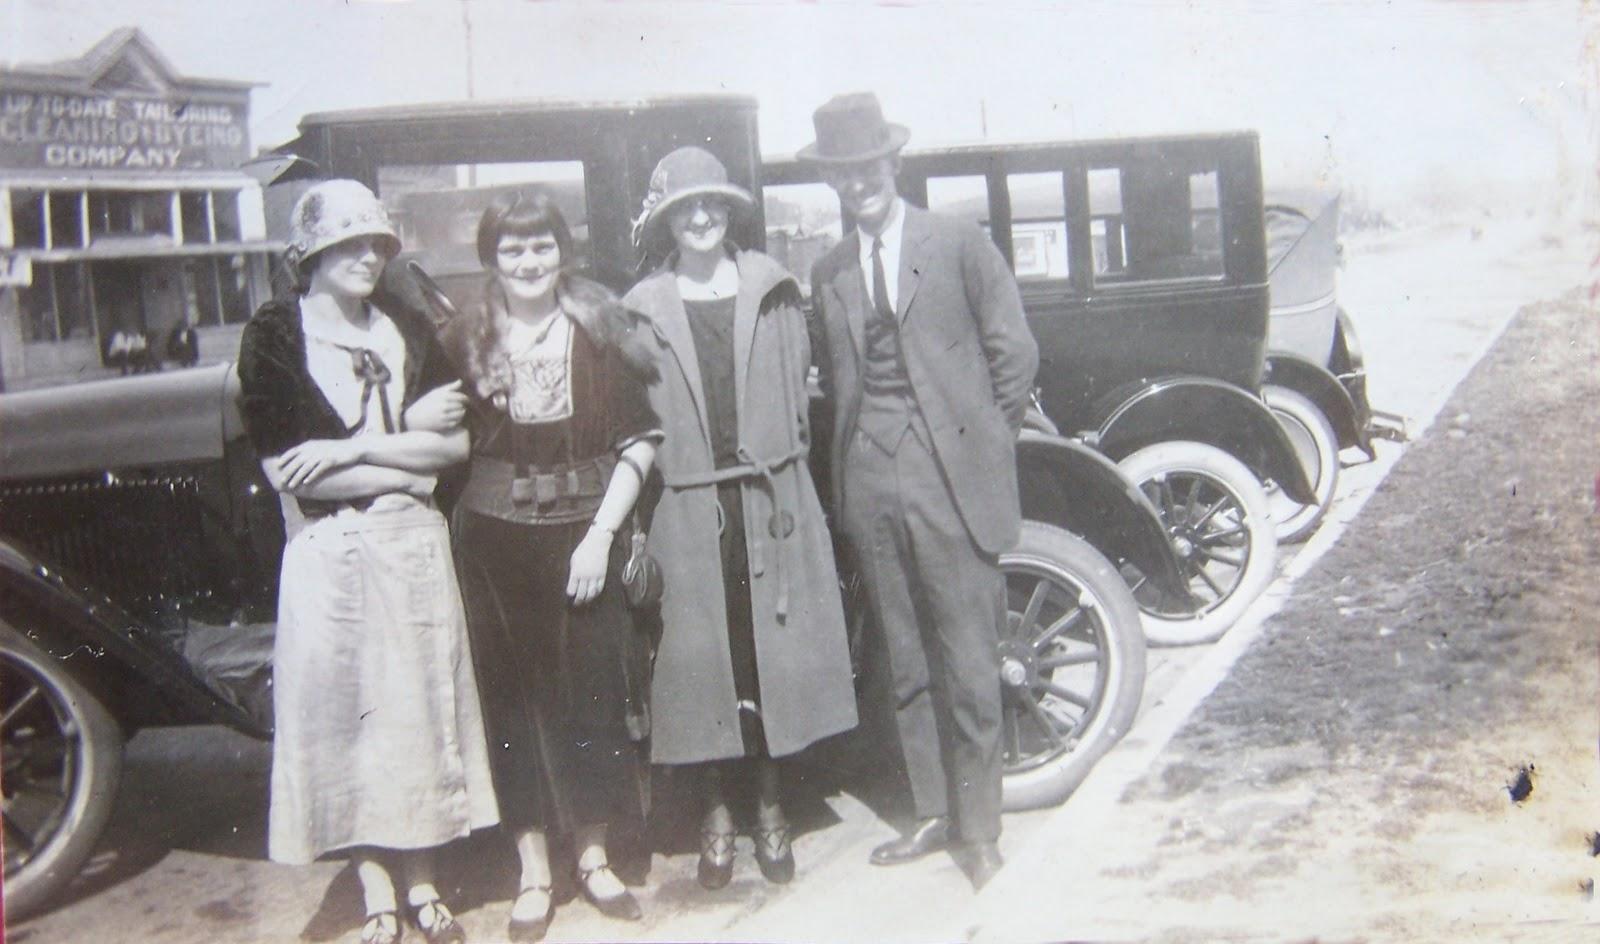 Roller skating hazel grove - Hazel Was Engaged To Another Man When She Met Her Husband Raymond Werner Warren In Coalgate Oklahoma